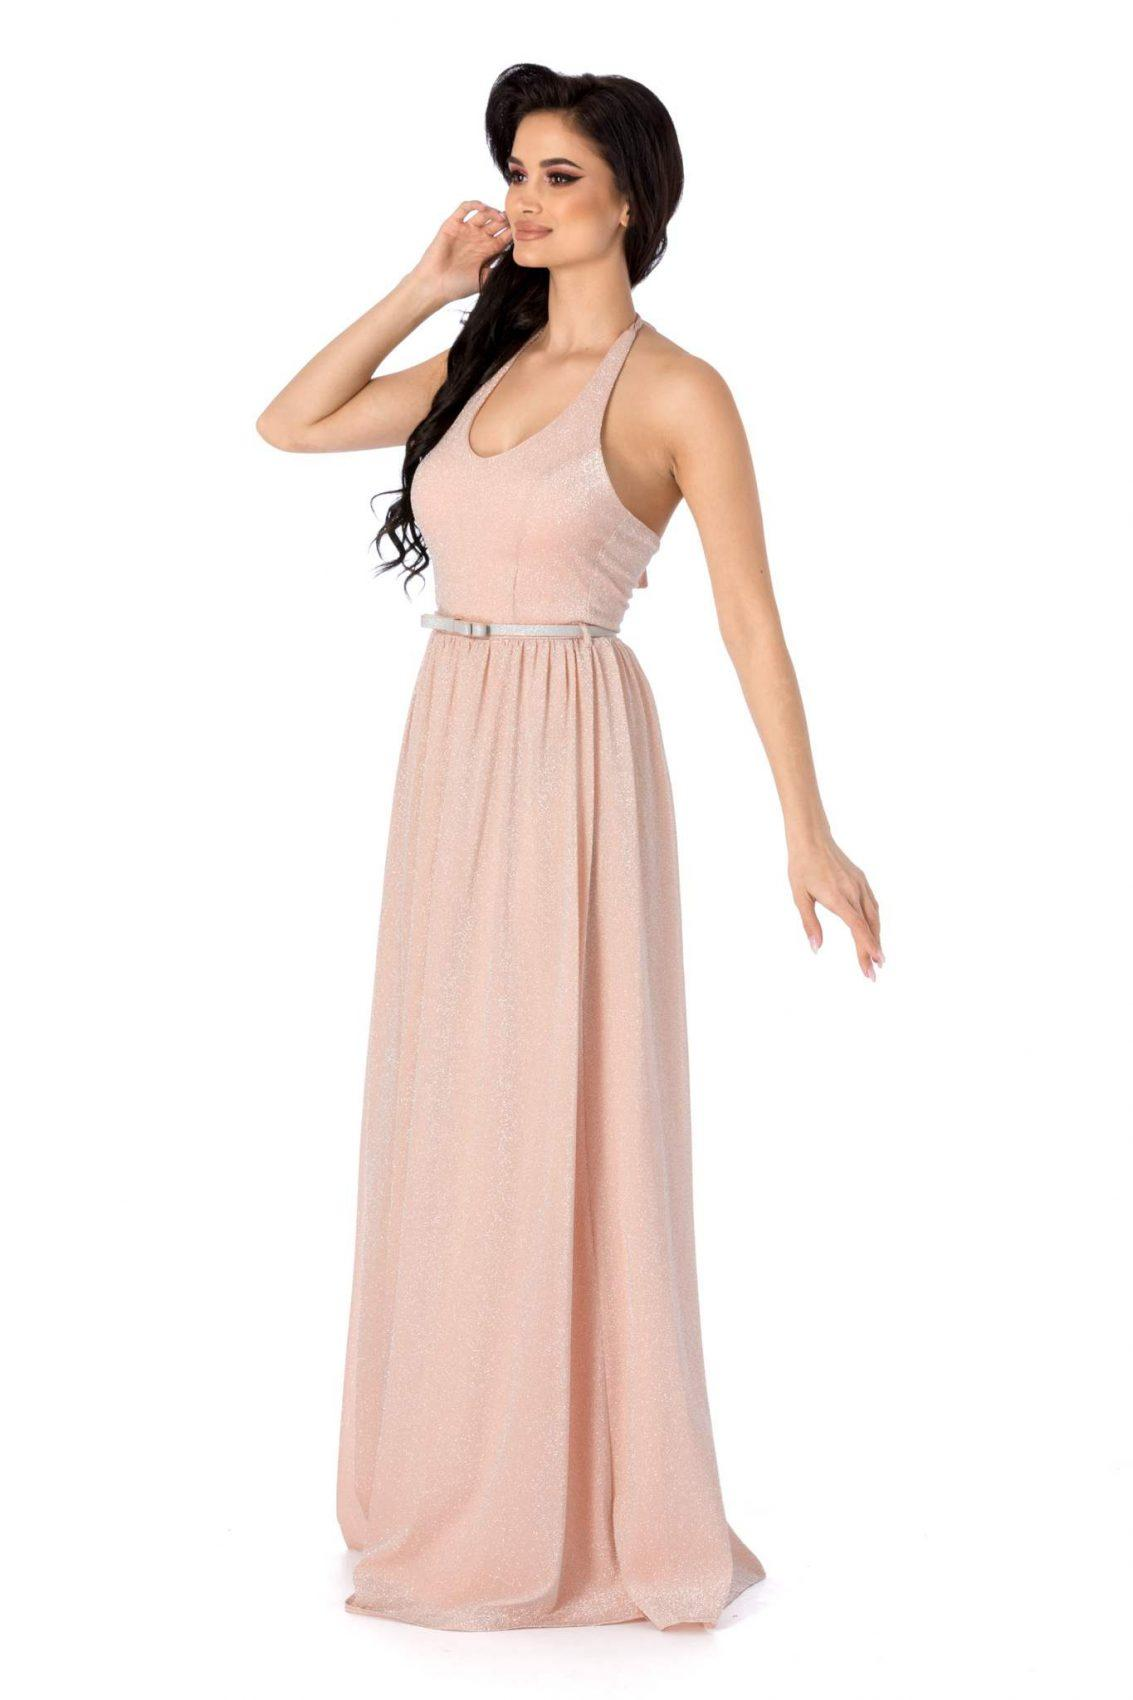 Calypso Ροζ Φόρεμα 3135